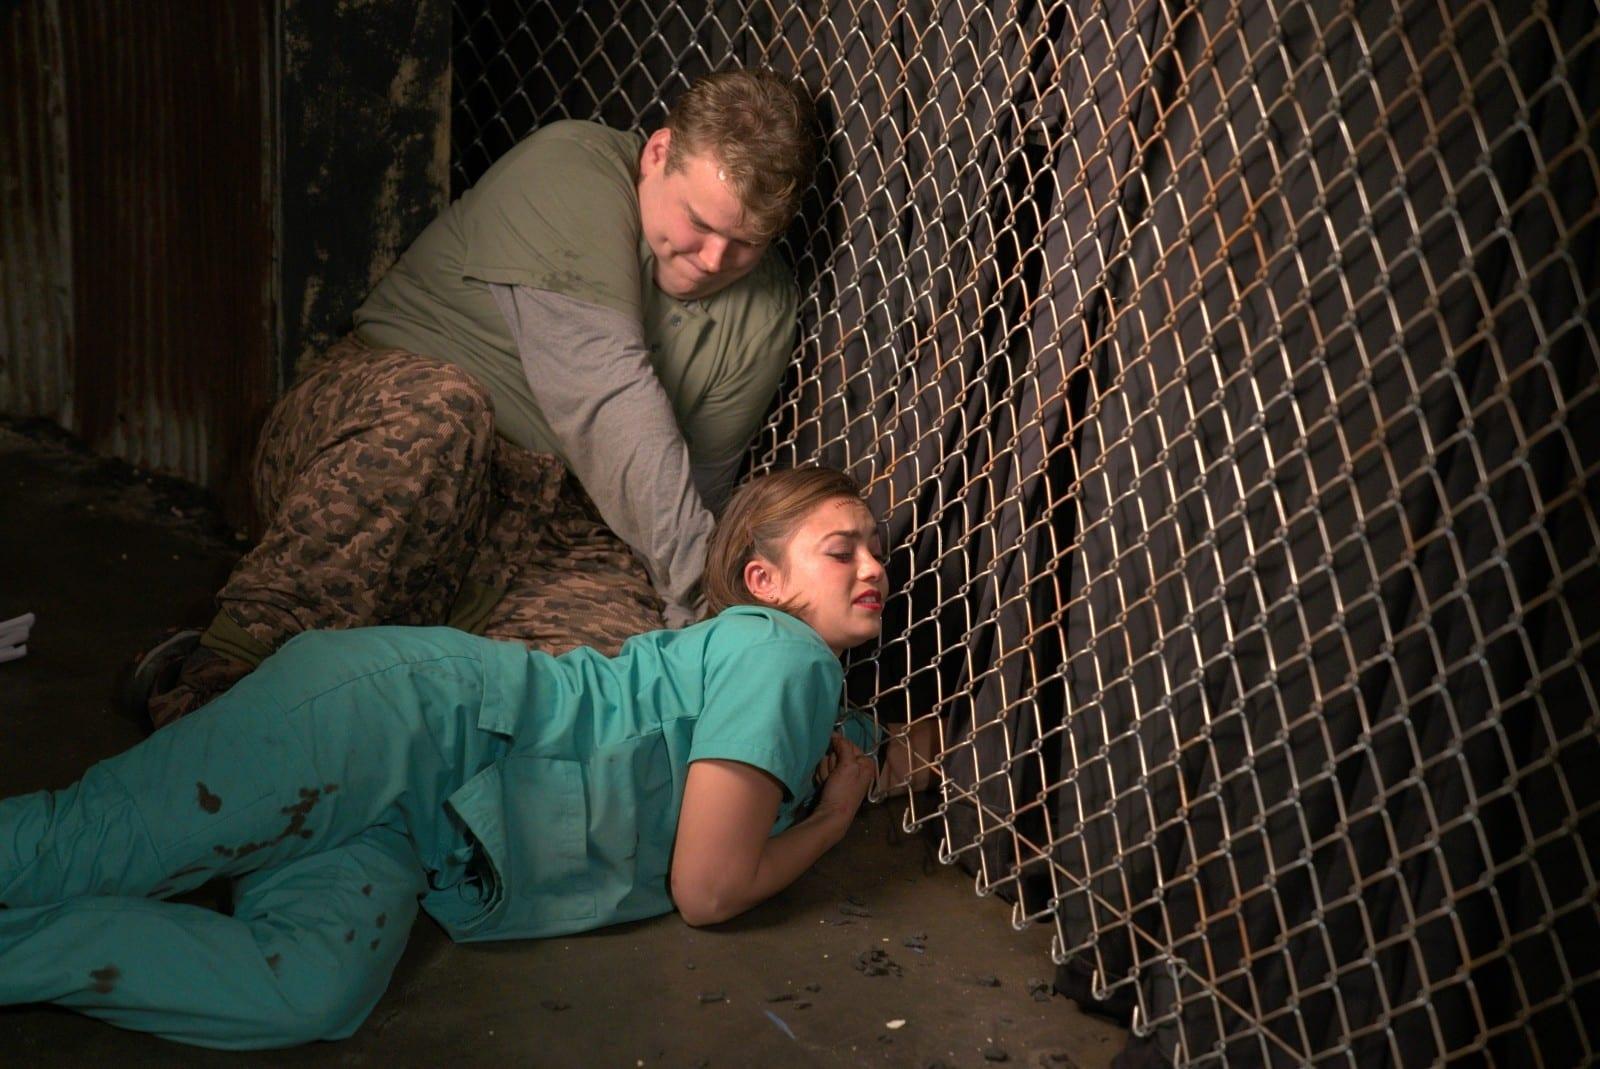 08_Evan (Andrew Caldwell) versucht Angela (Shazi Raja) zu helfen